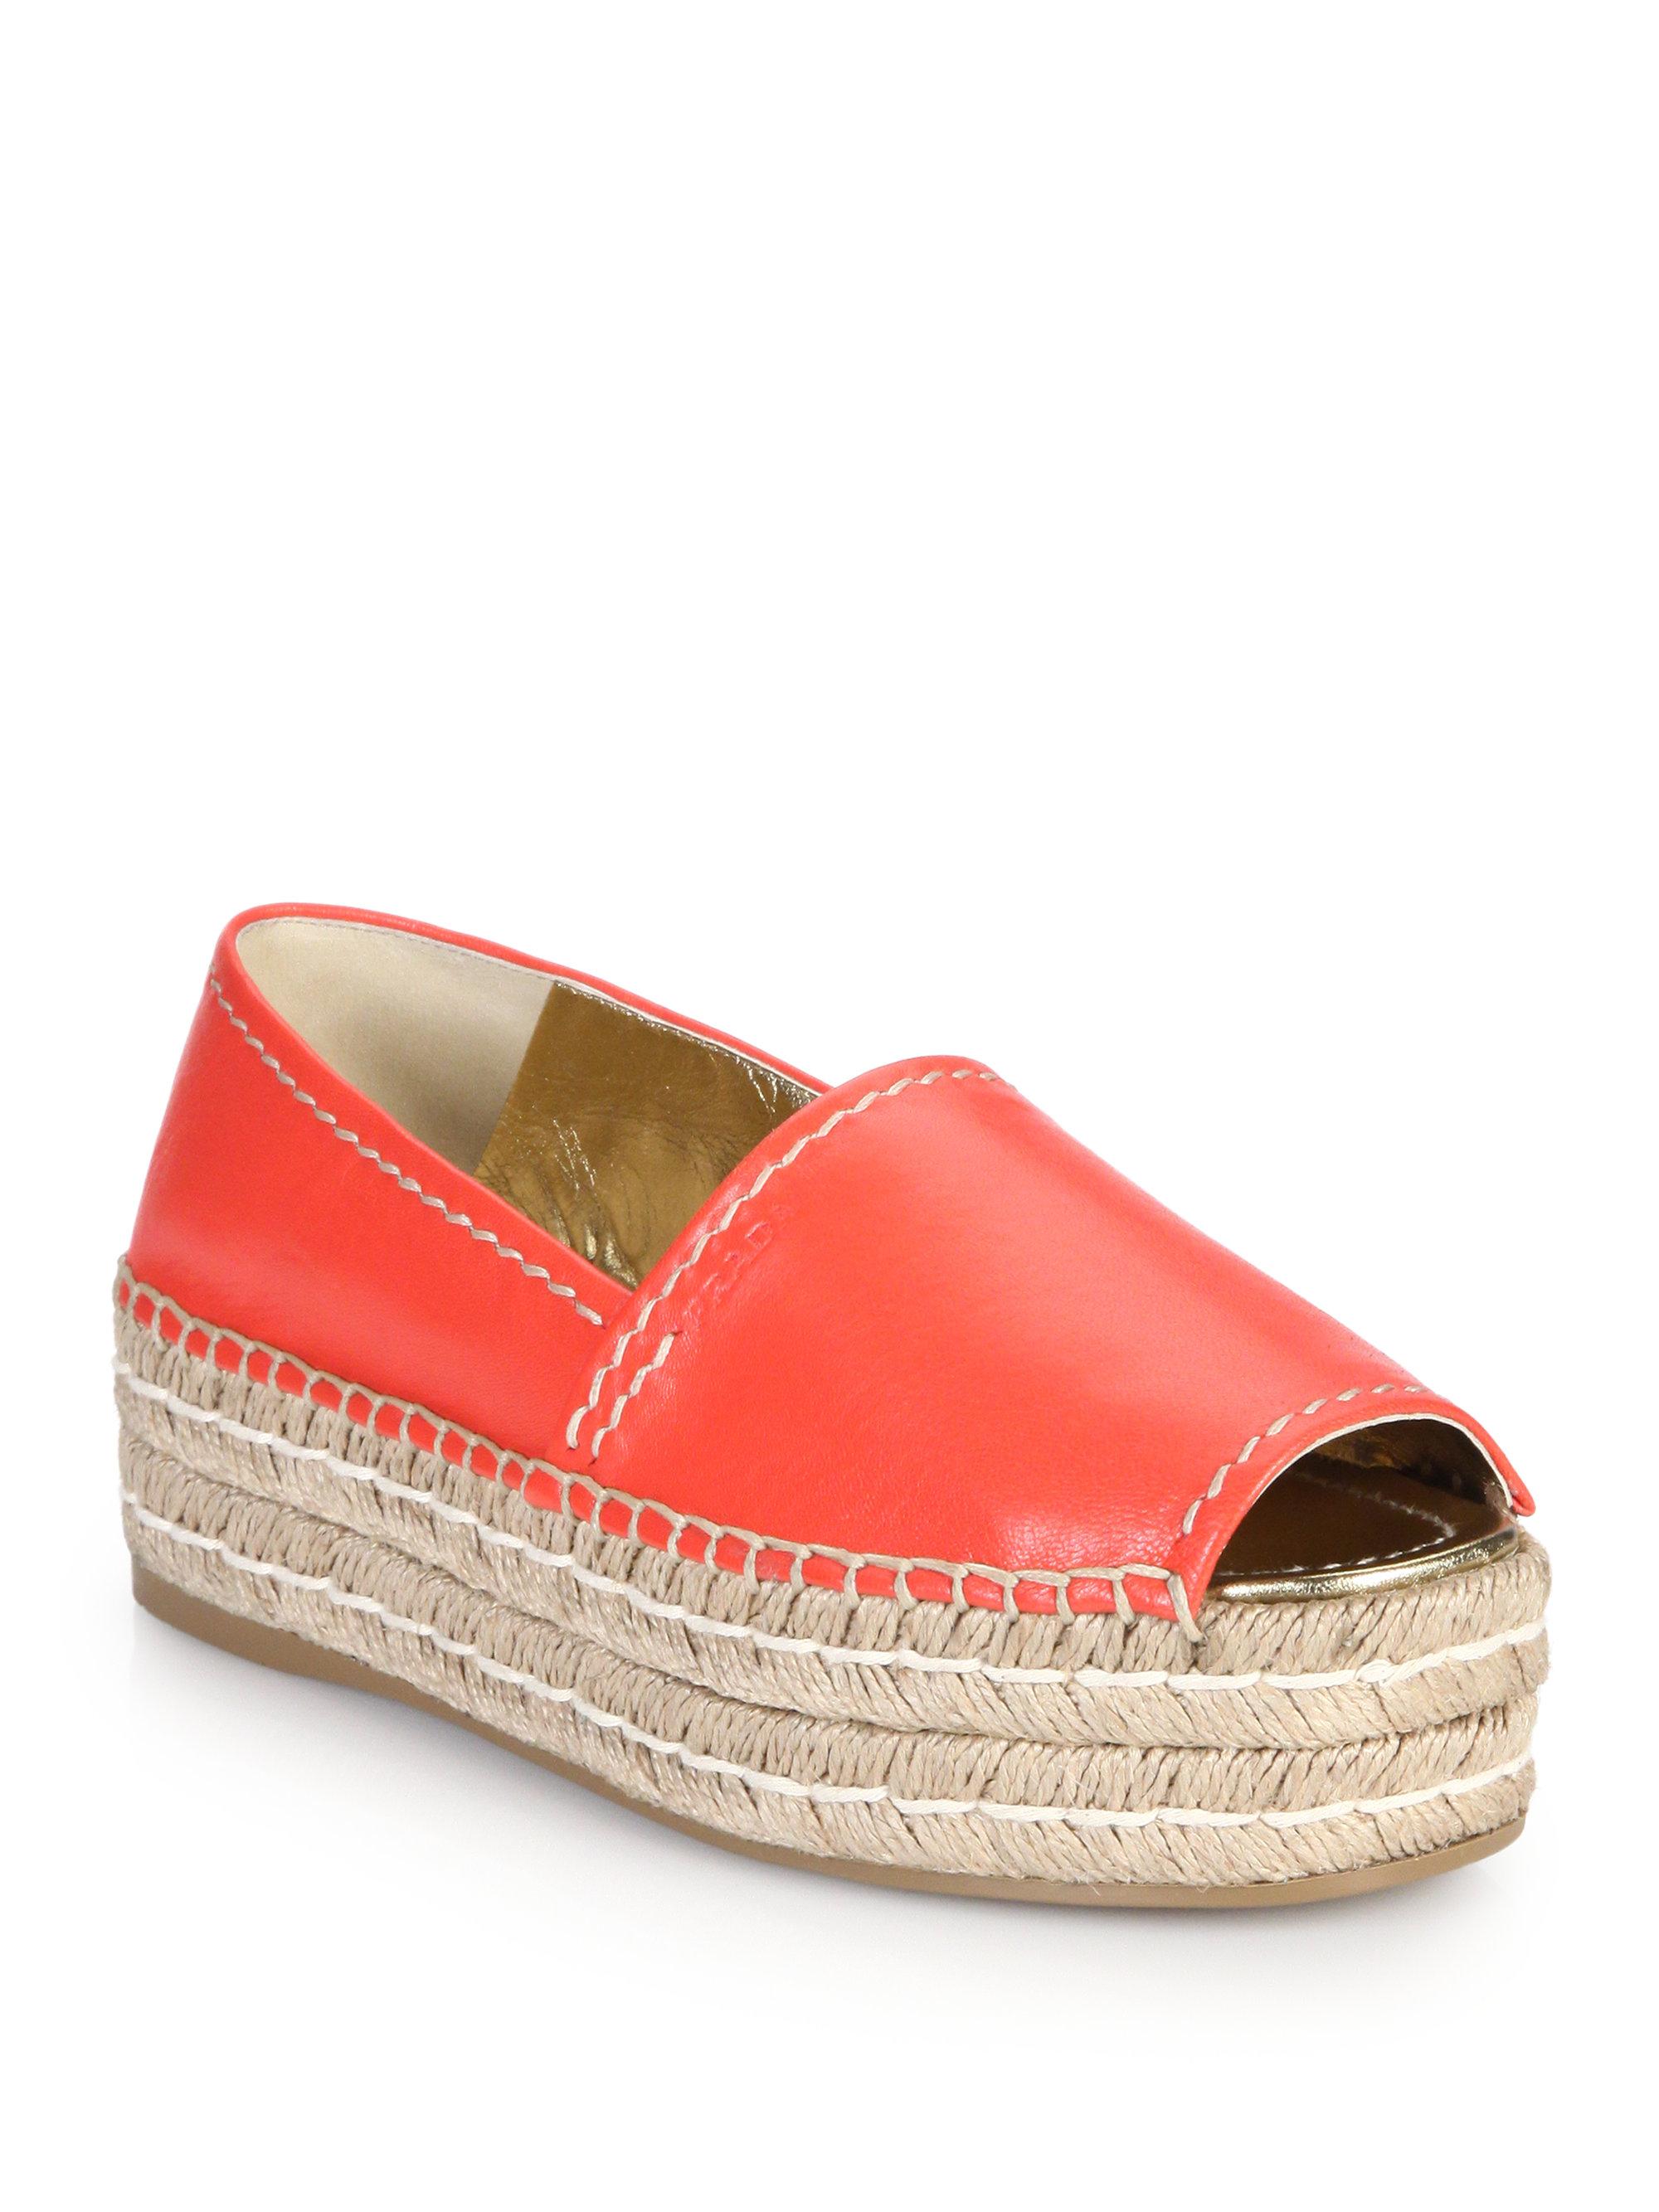 red prada bag - Prada Open-toe Leather Platform Espadrilles in Red | Lyst